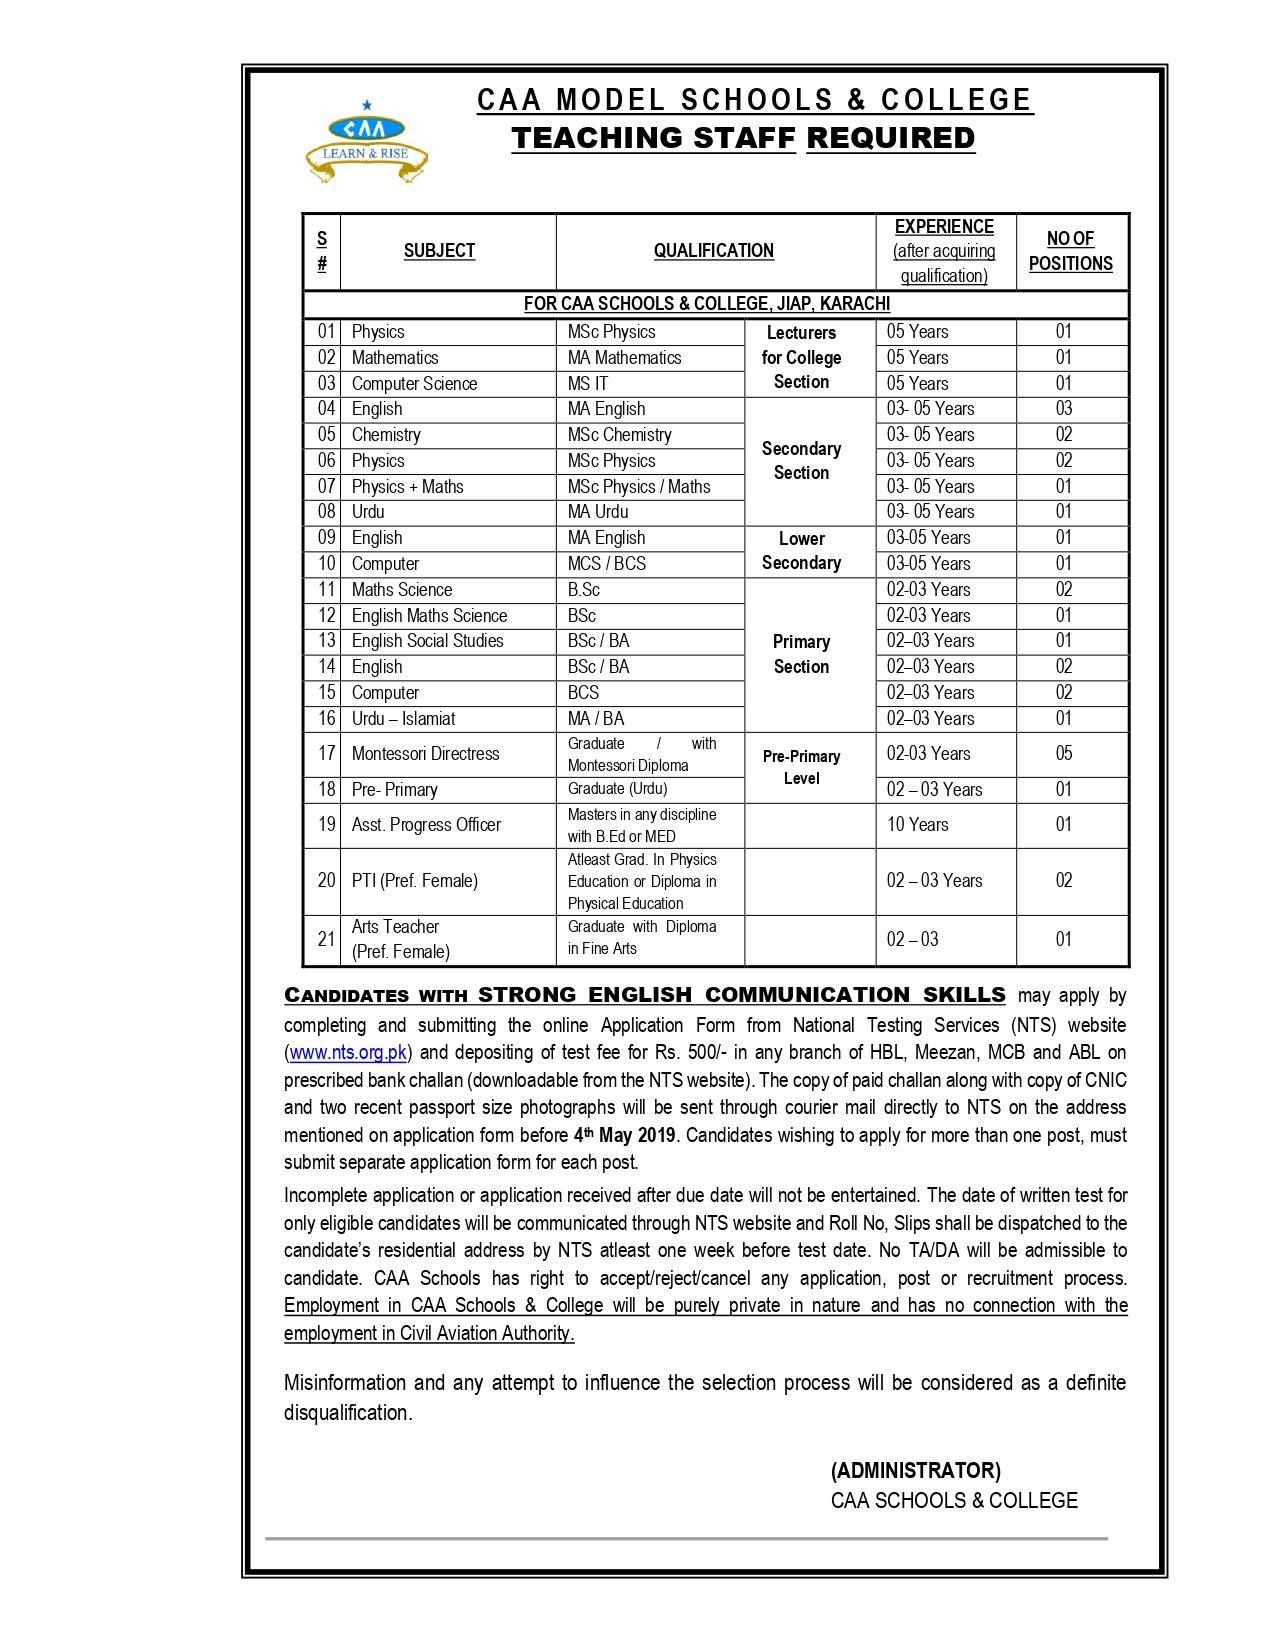 CAA Model Schools College JIAP Teaching Jobs NTS Test Roll No Slip